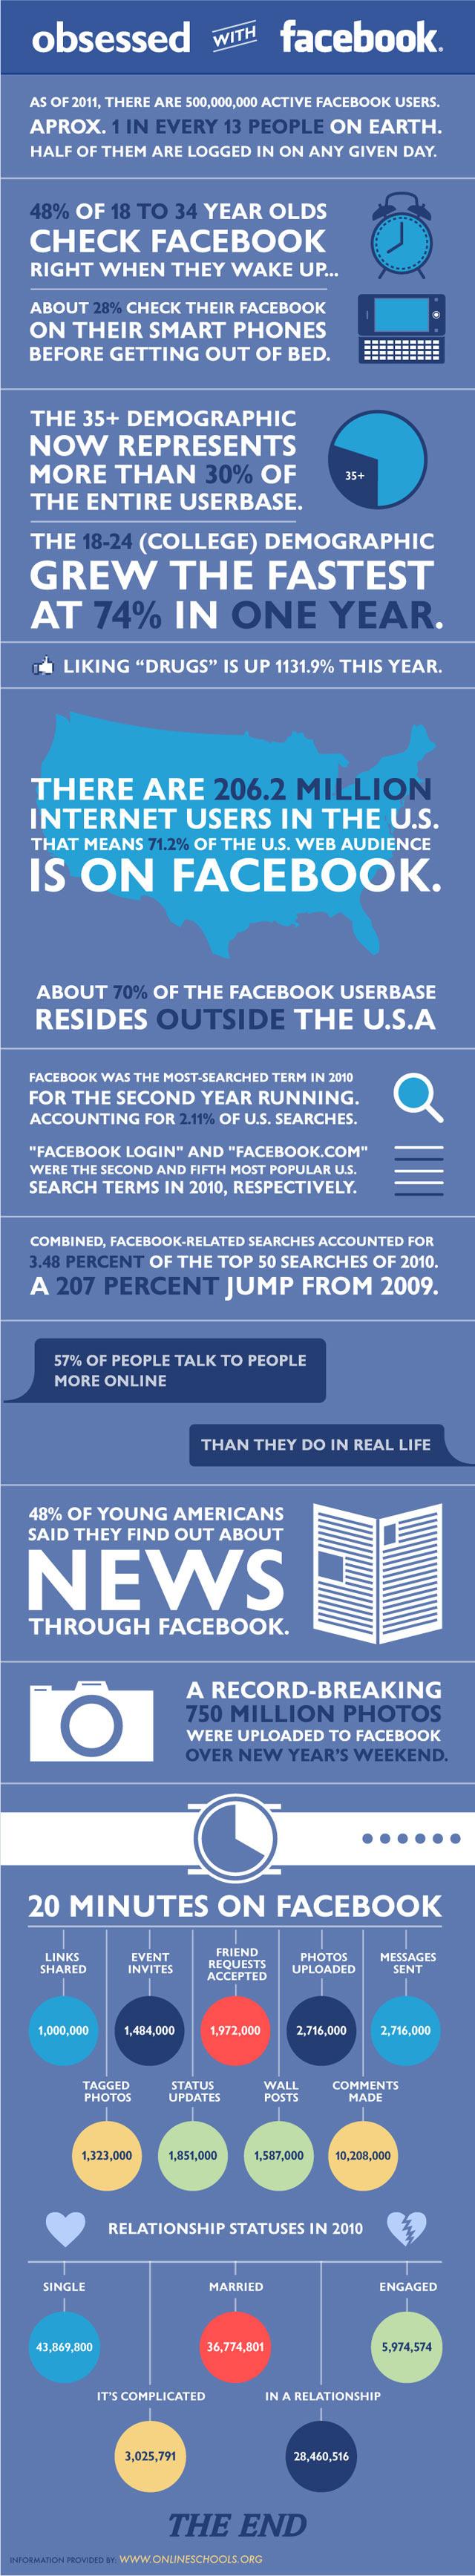 Facebook Usage Stats